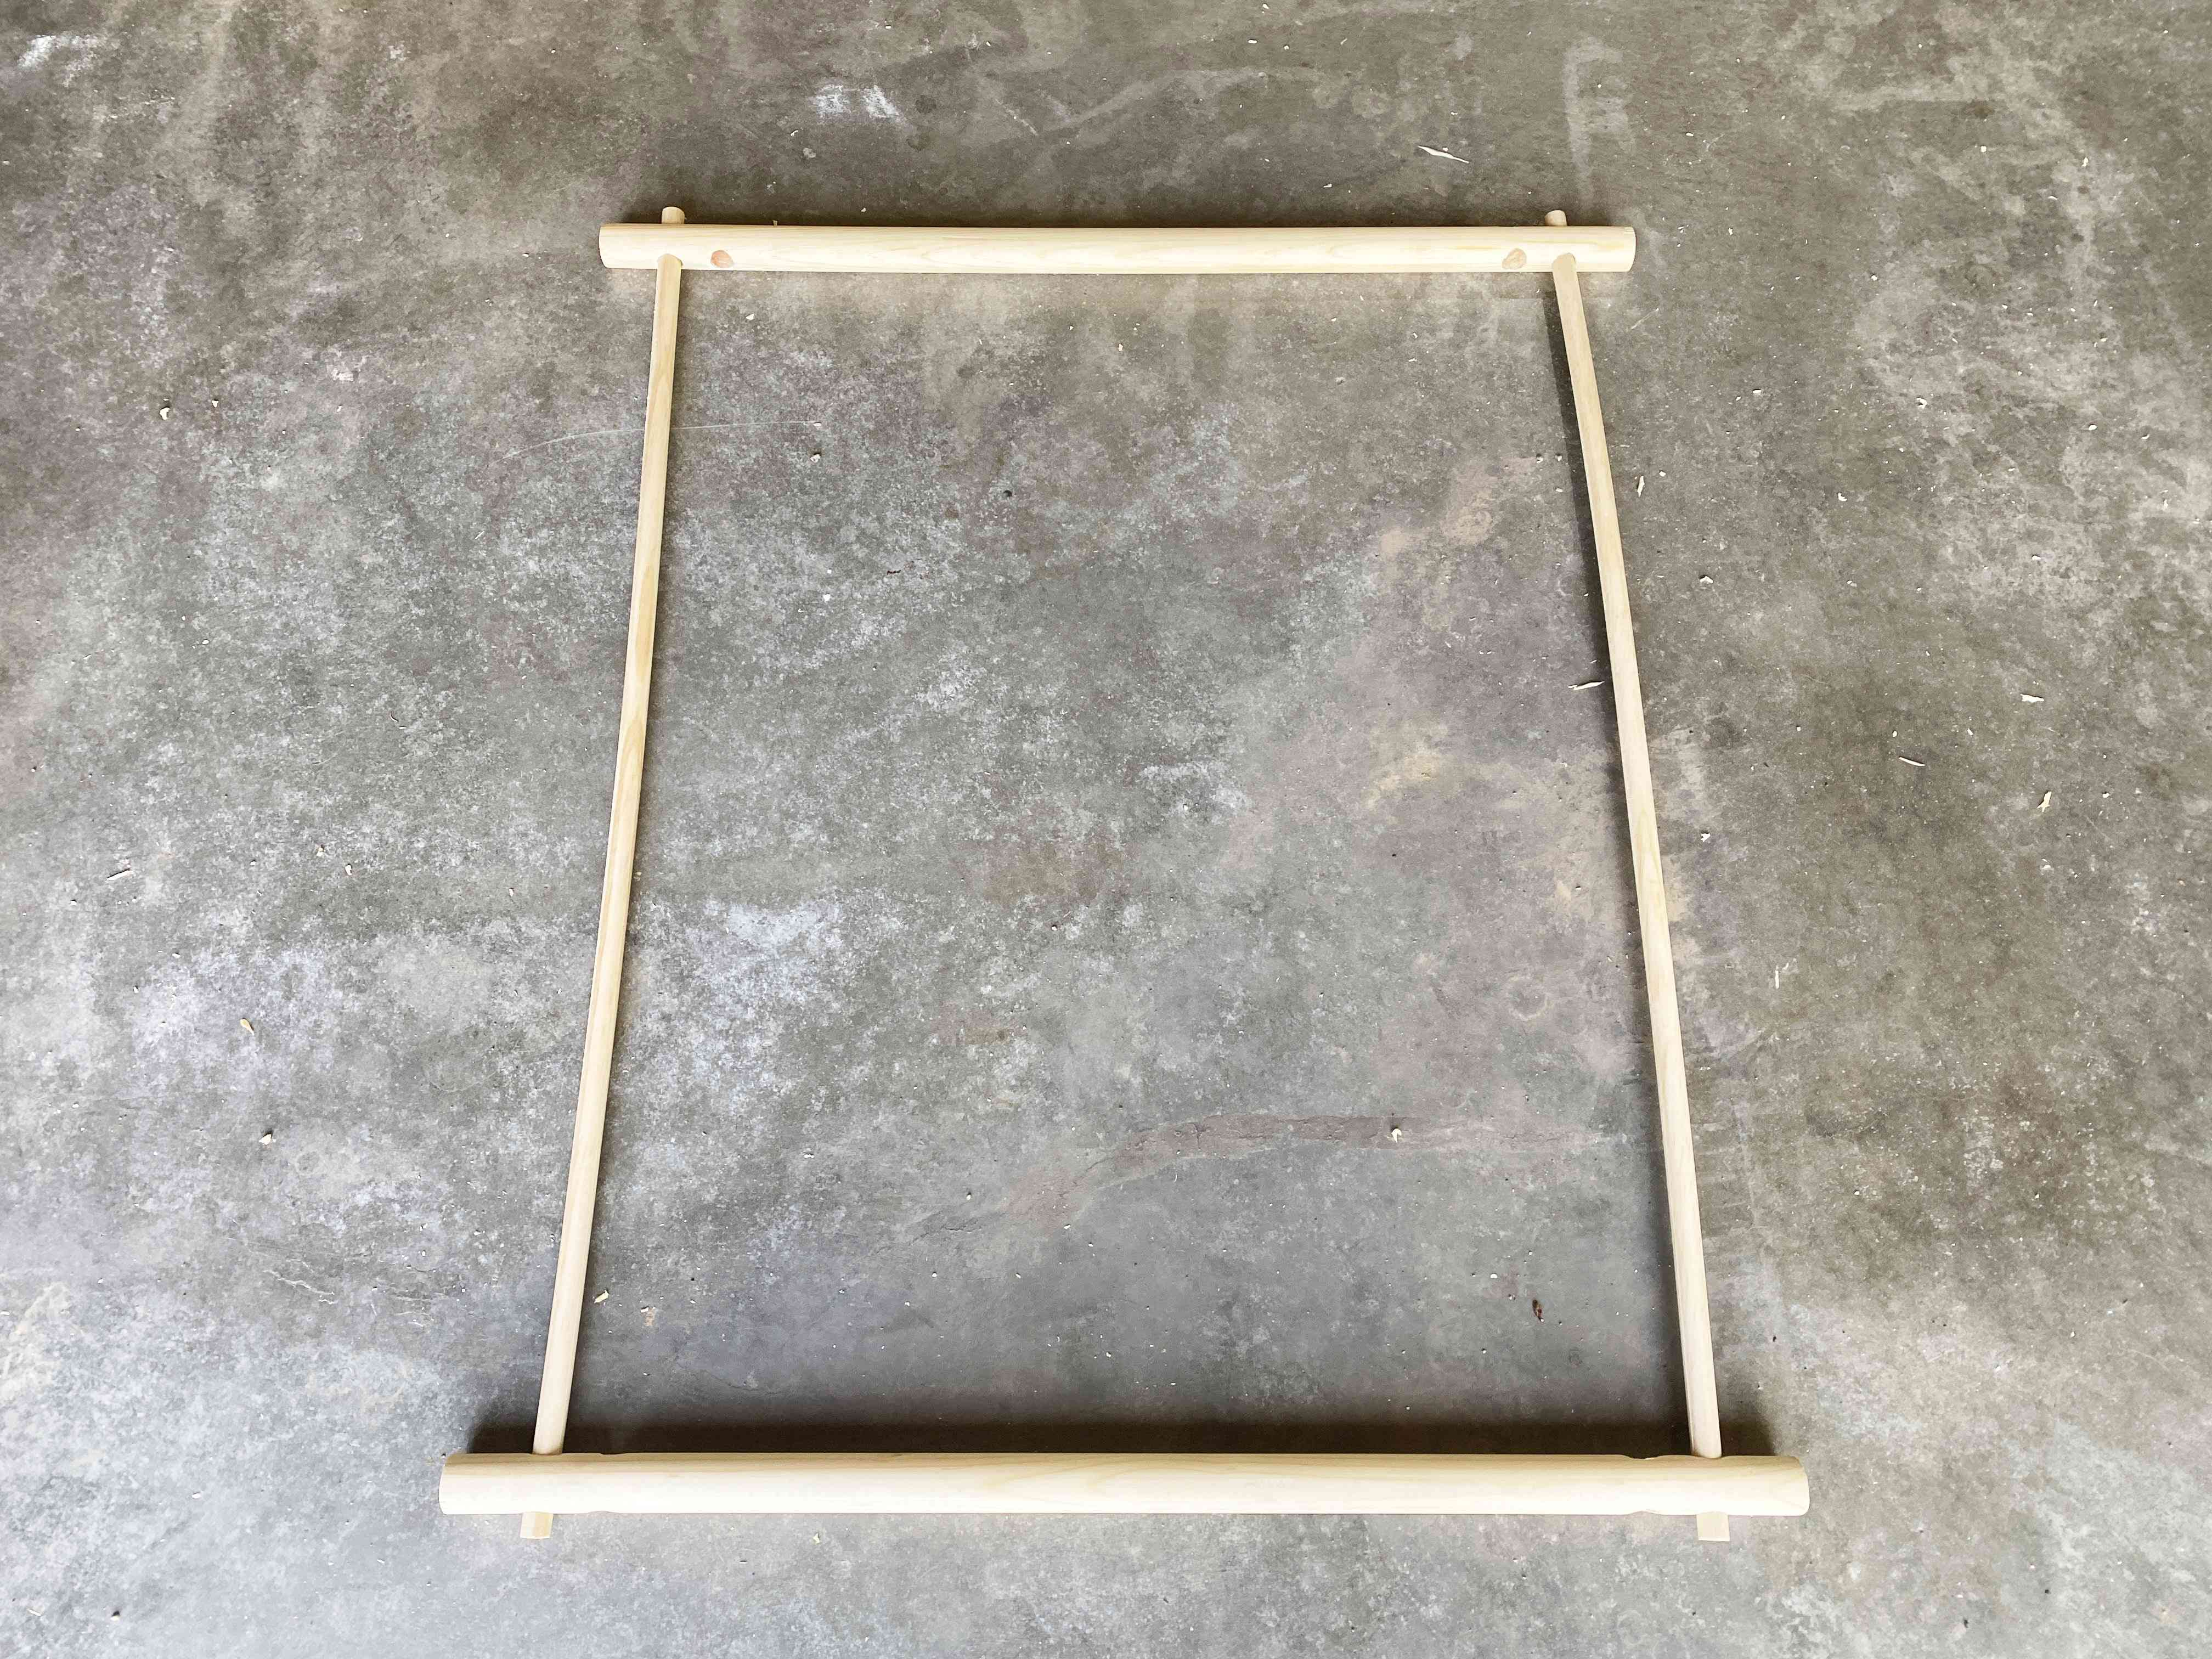 A rectangular frame